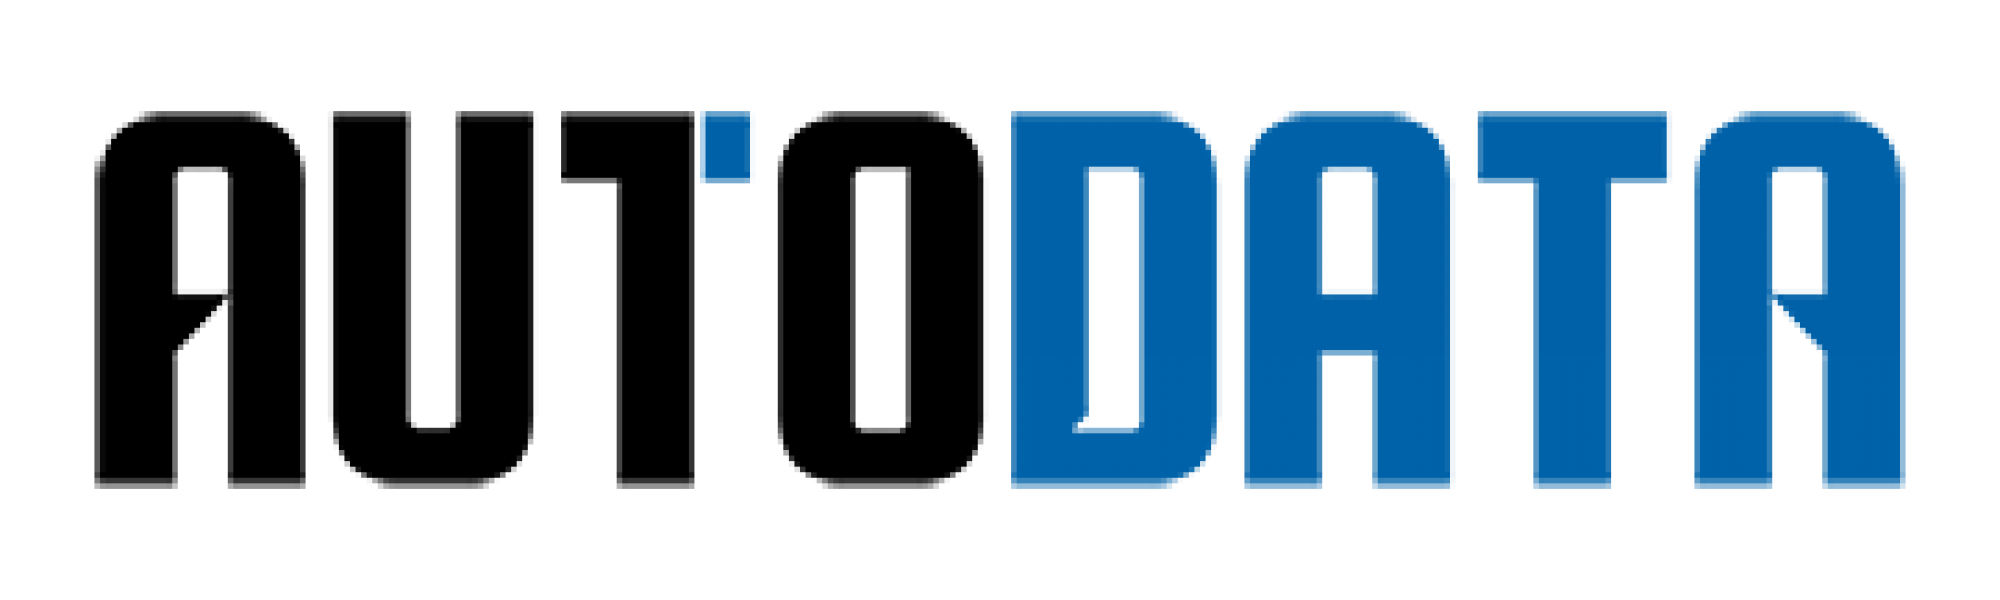 autodata-logo